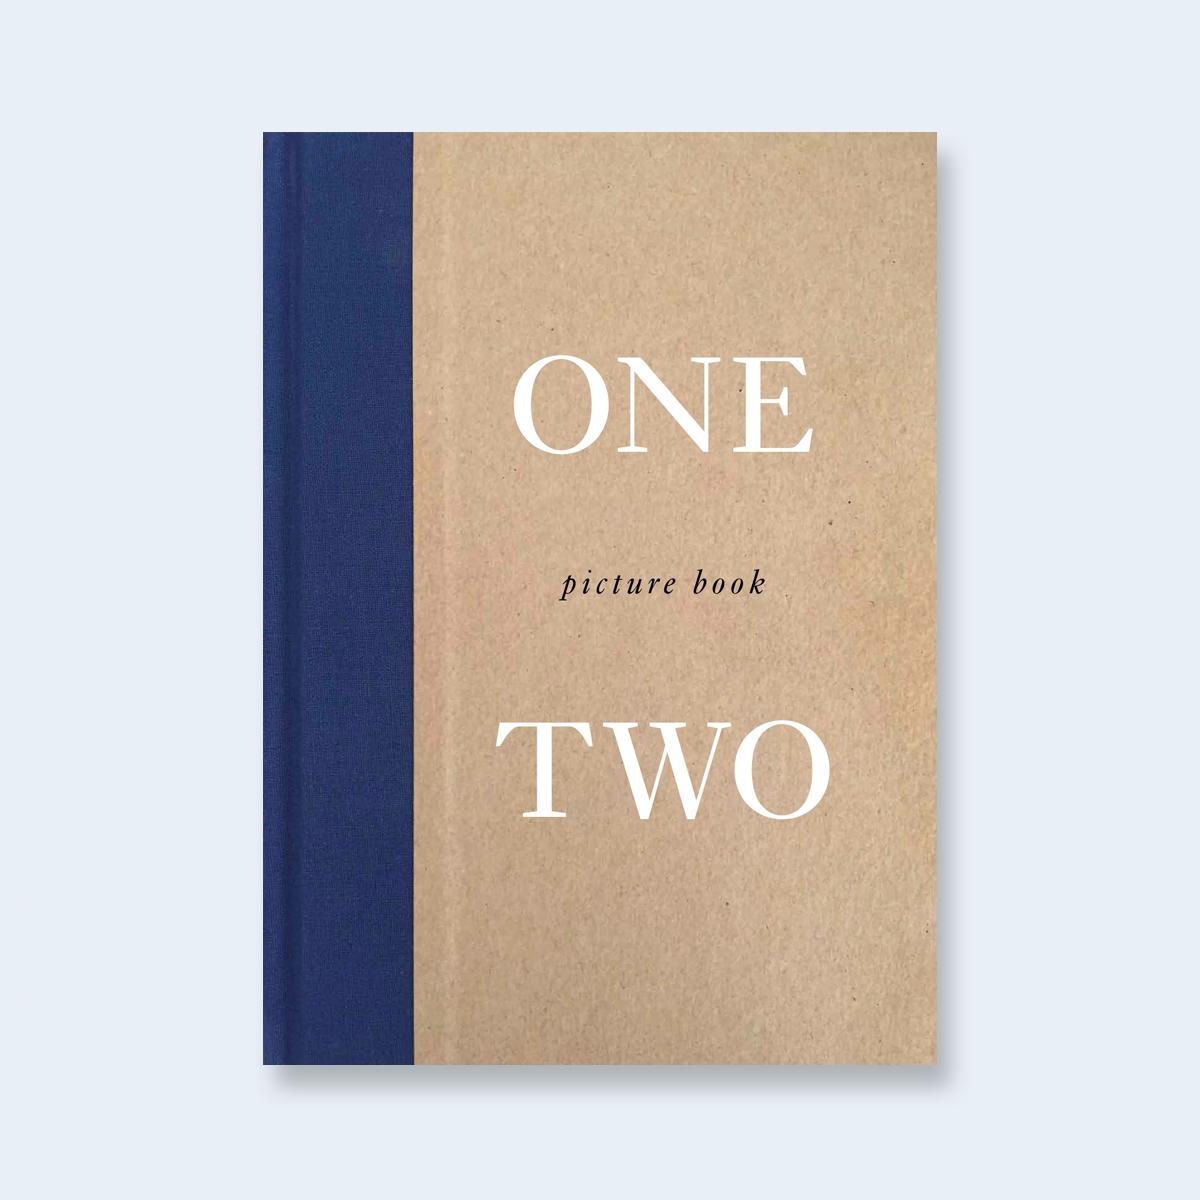 NAZRAELI PRESS  |   One Picture Book Two  Series | More Info  >